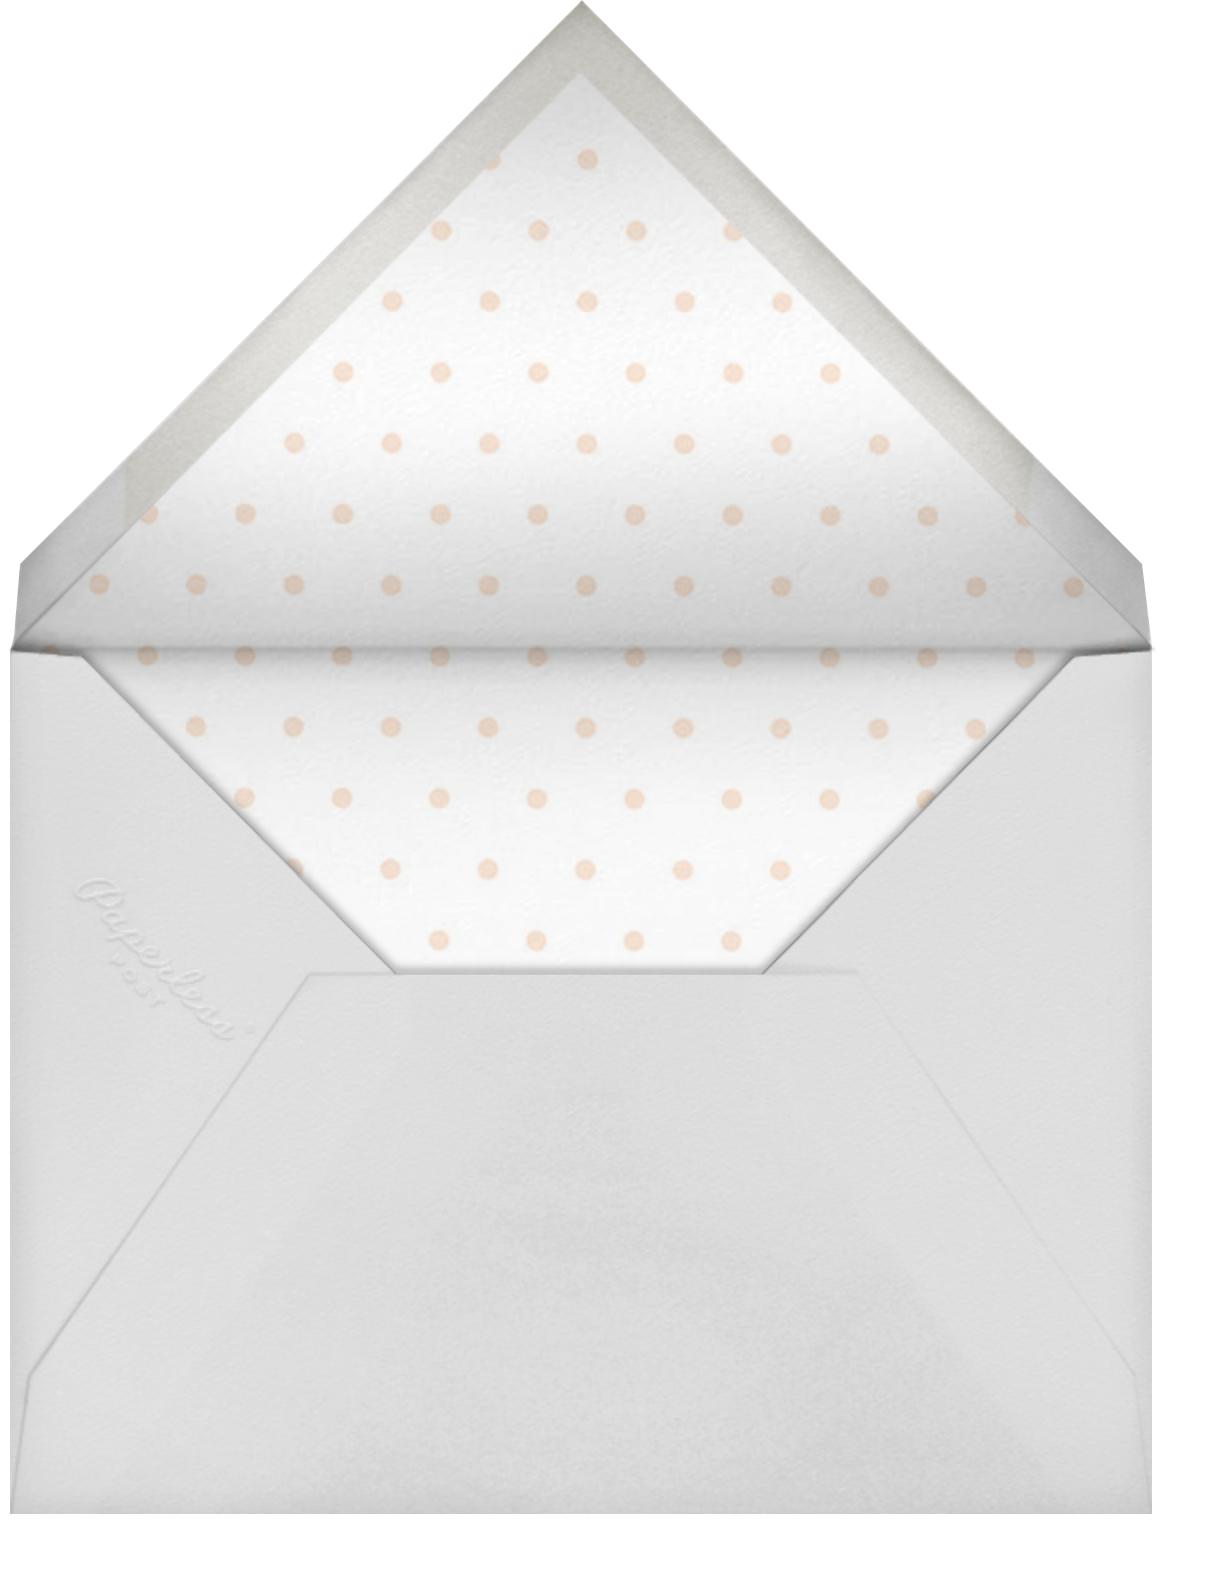 Mellow Dots - Sugar Paper - Envelope